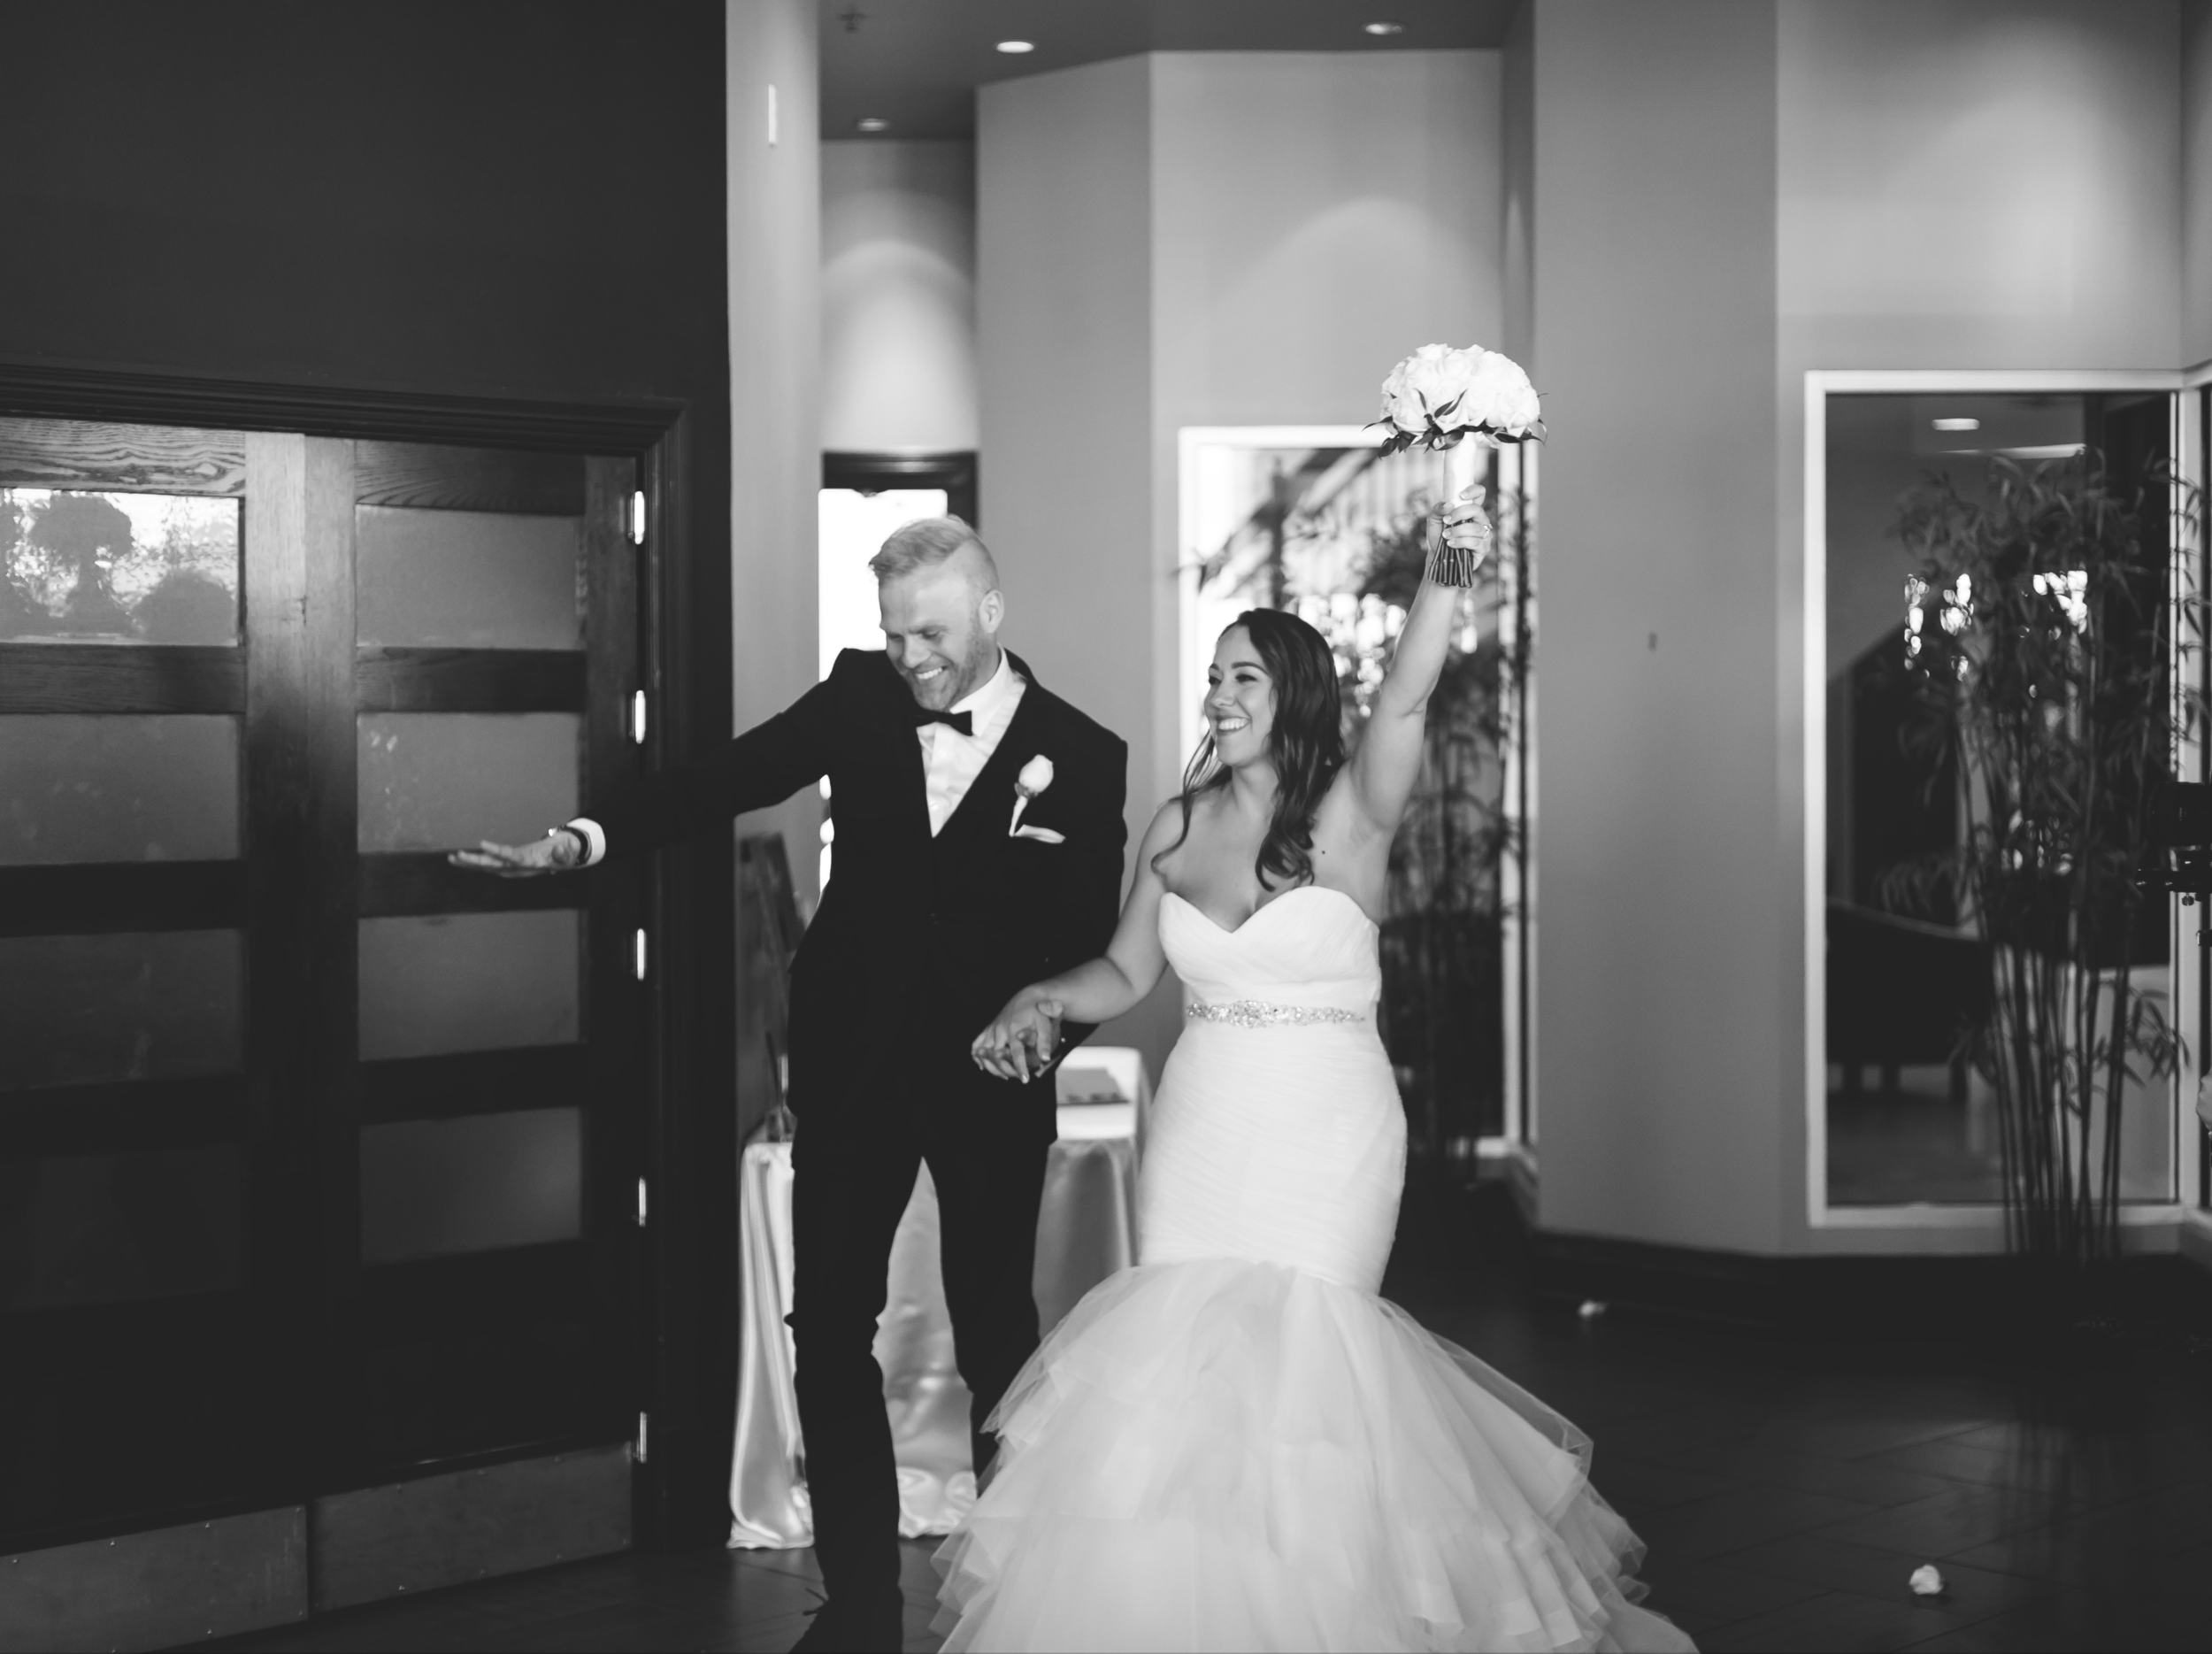 Wedding-Harbour-Banquet-Center-Oakville-Photographer-Wedding-Hamilton-Saint-James-Espresso-Downtown-HamOnt-GTA-Niagara-Toronto-Moments-by-Lauren-Photography-Photo-Image-53.png